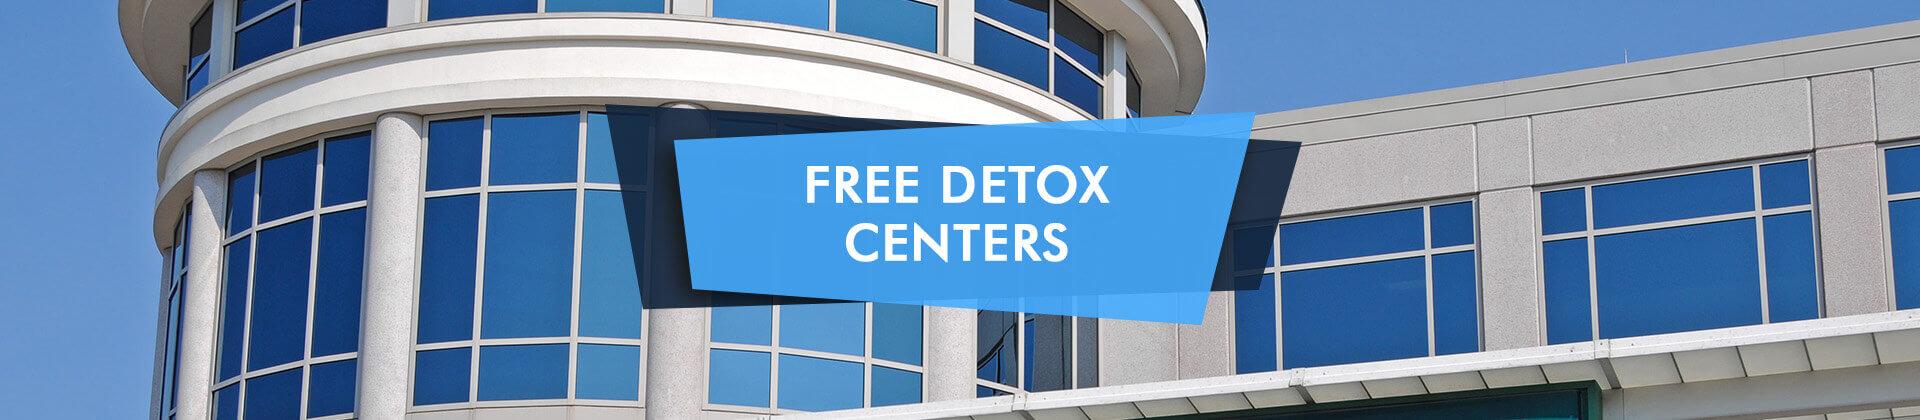 free detox facilities